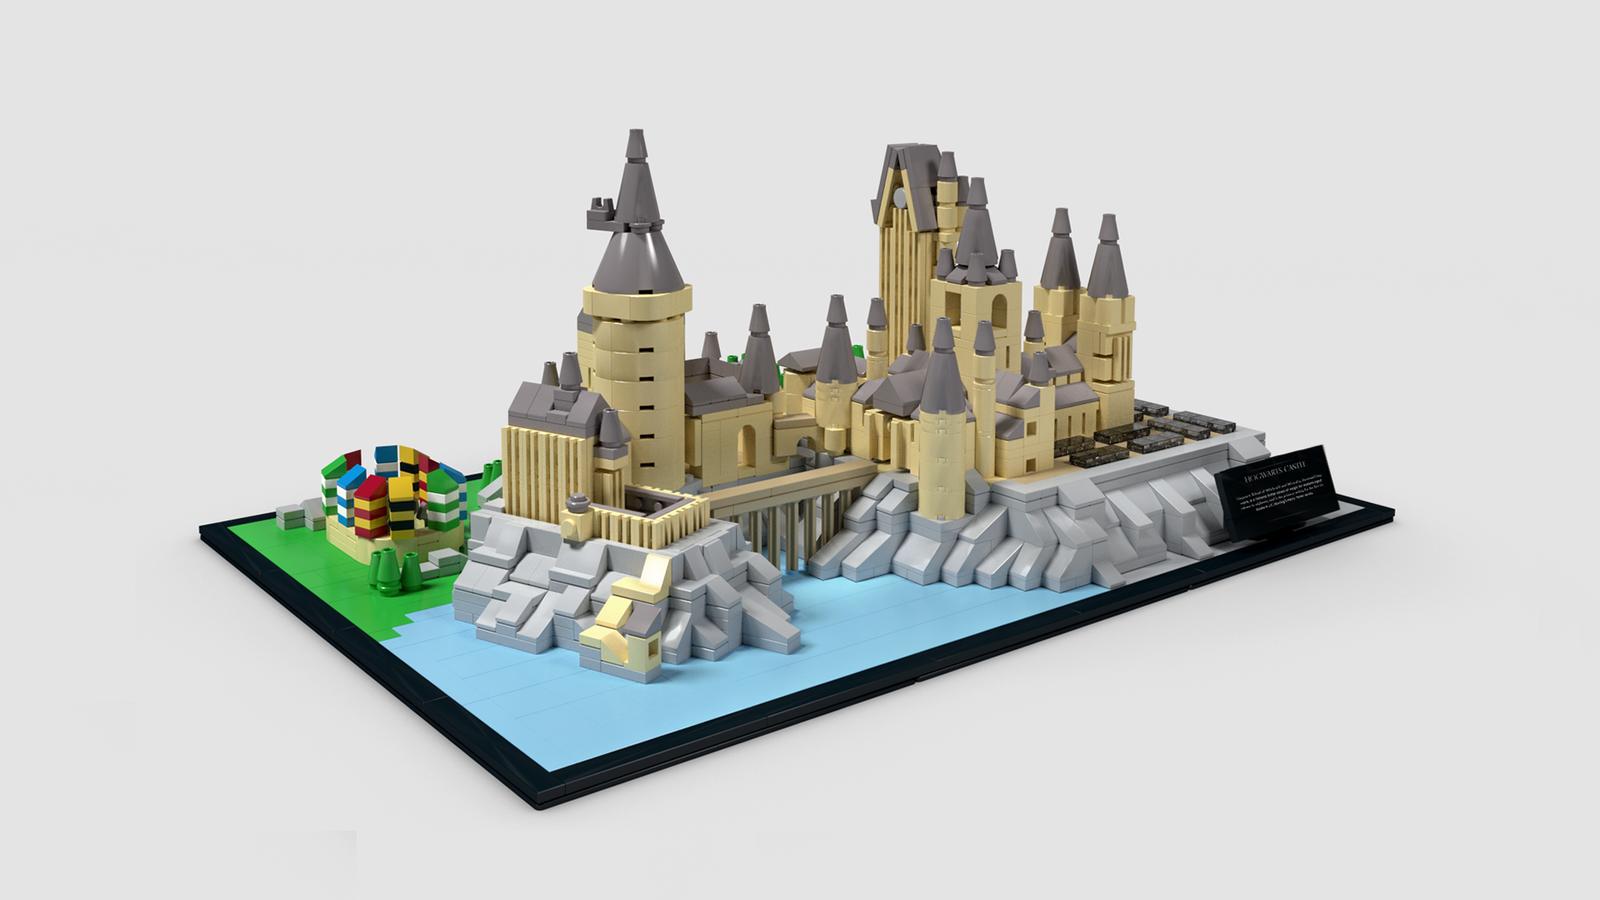 Hogwarts Castle Micro Micro Lego Lego Hogwarts Lego Projects